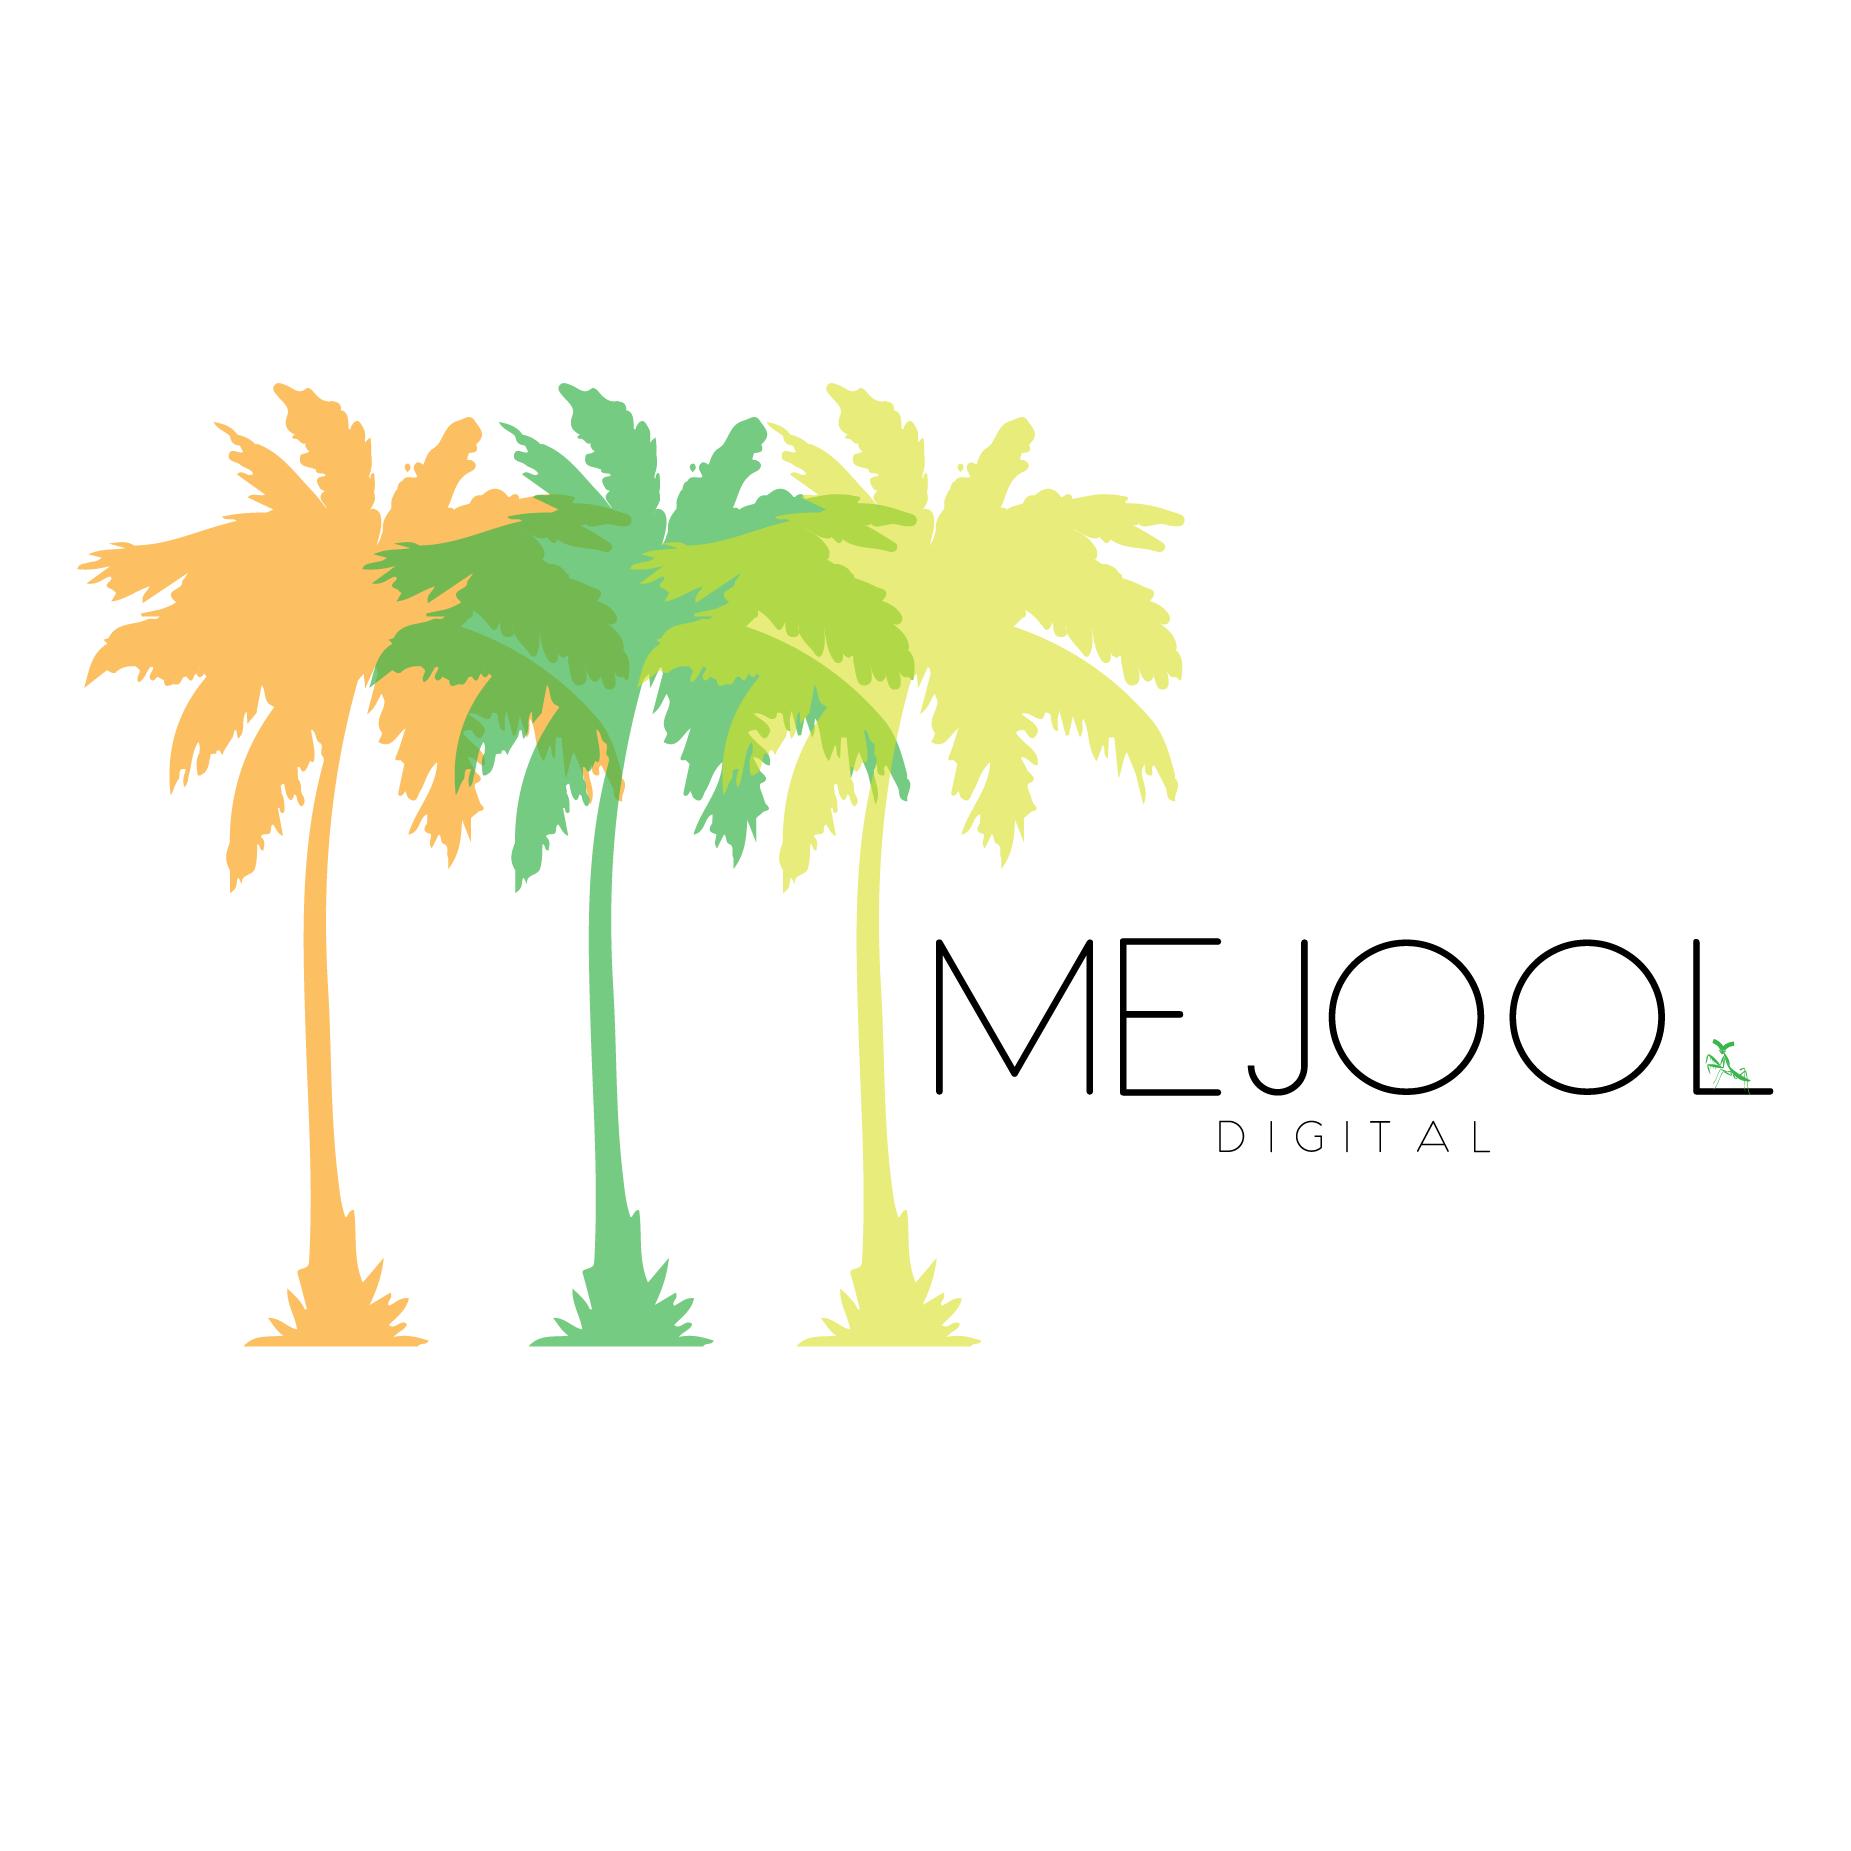 Mejool Final.png